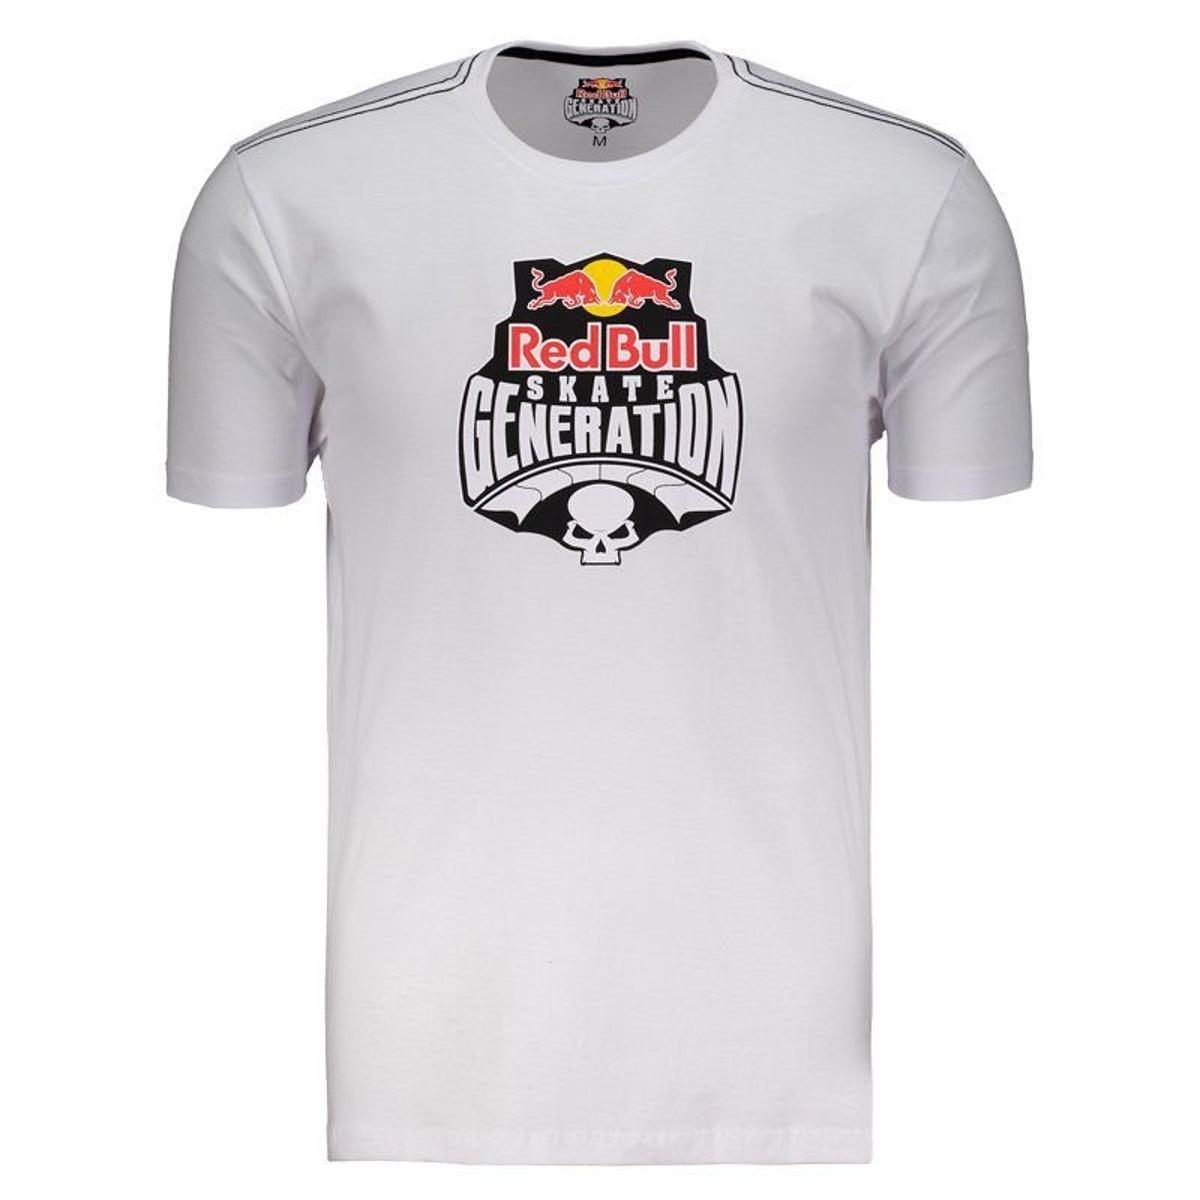 144211a3bd30e Camiseta Red Bull Generation Masculina - Branco - Compre Agora ...